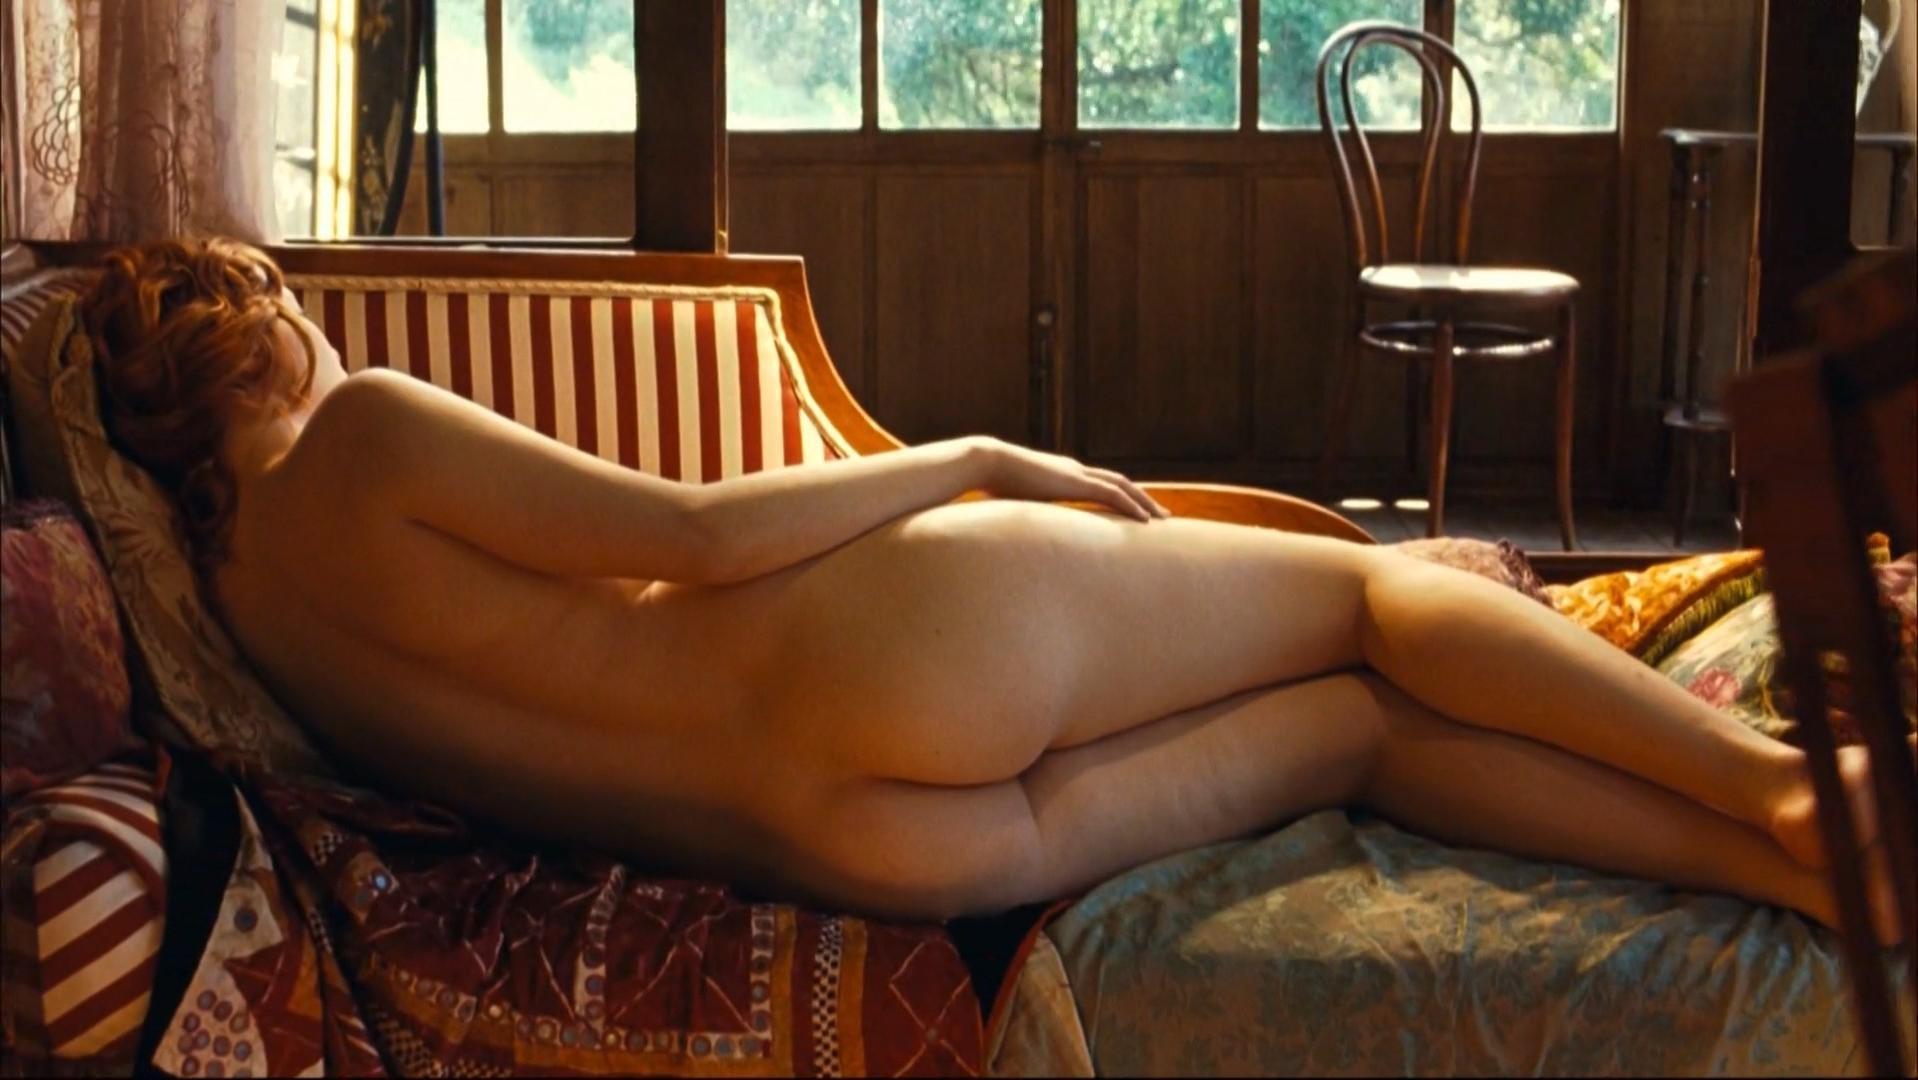 Christa Theret nude, Solene Rigot nude - Renoir (2012)